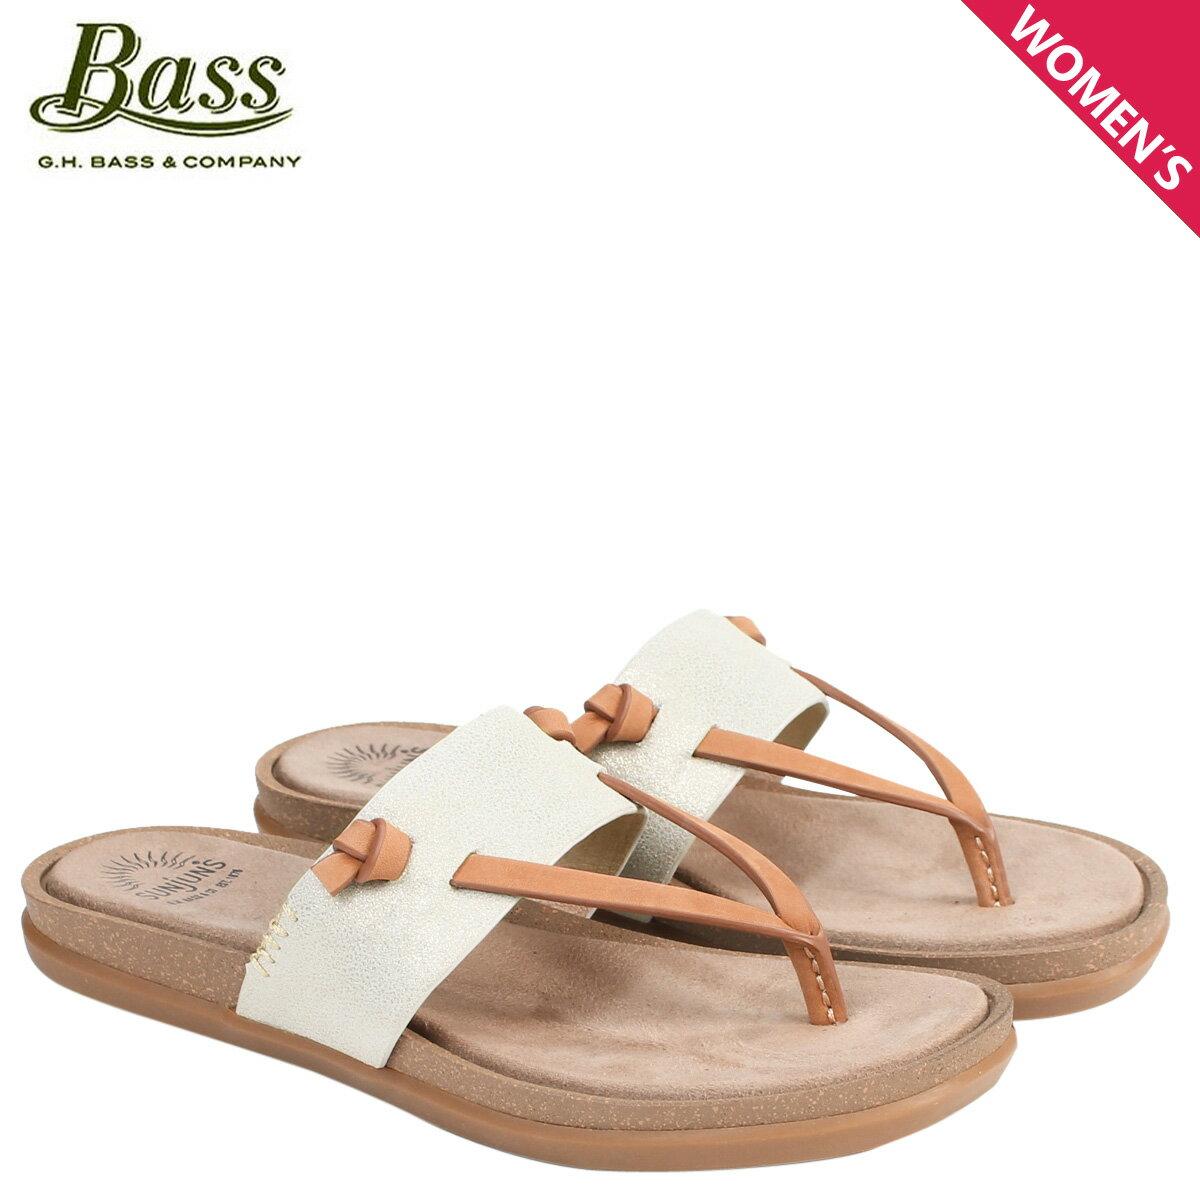 G.H. BASS サンダル レディース ジーエイチバス トングサンダル SHANNON THONG SUNJUNS 71-23012 靴 ゴールド